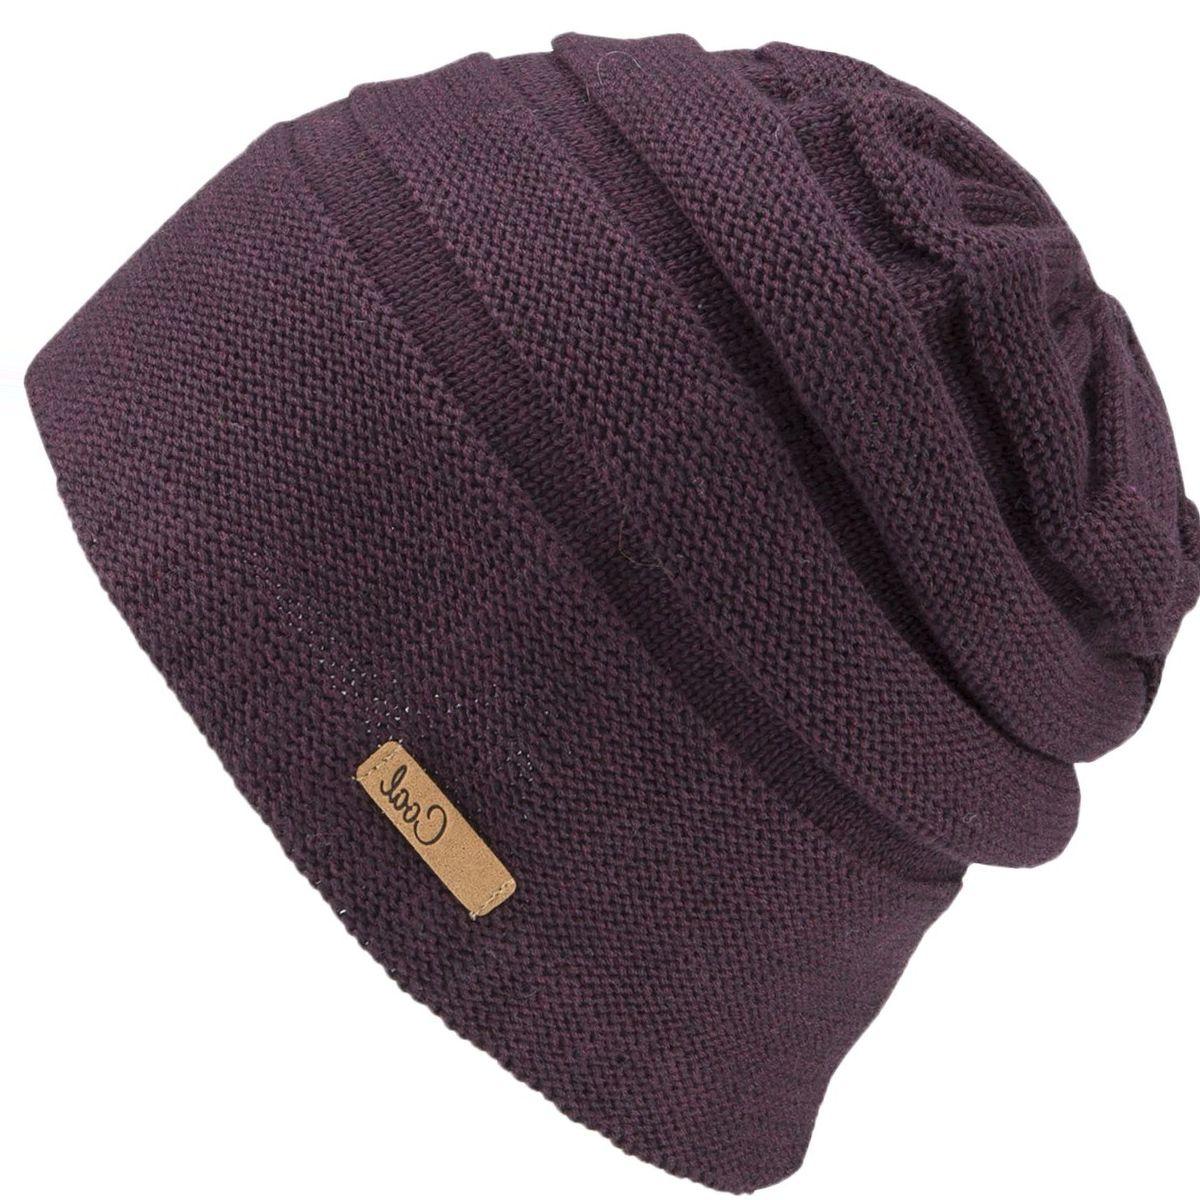 Coal Headwear Cameron Beanie - Women's